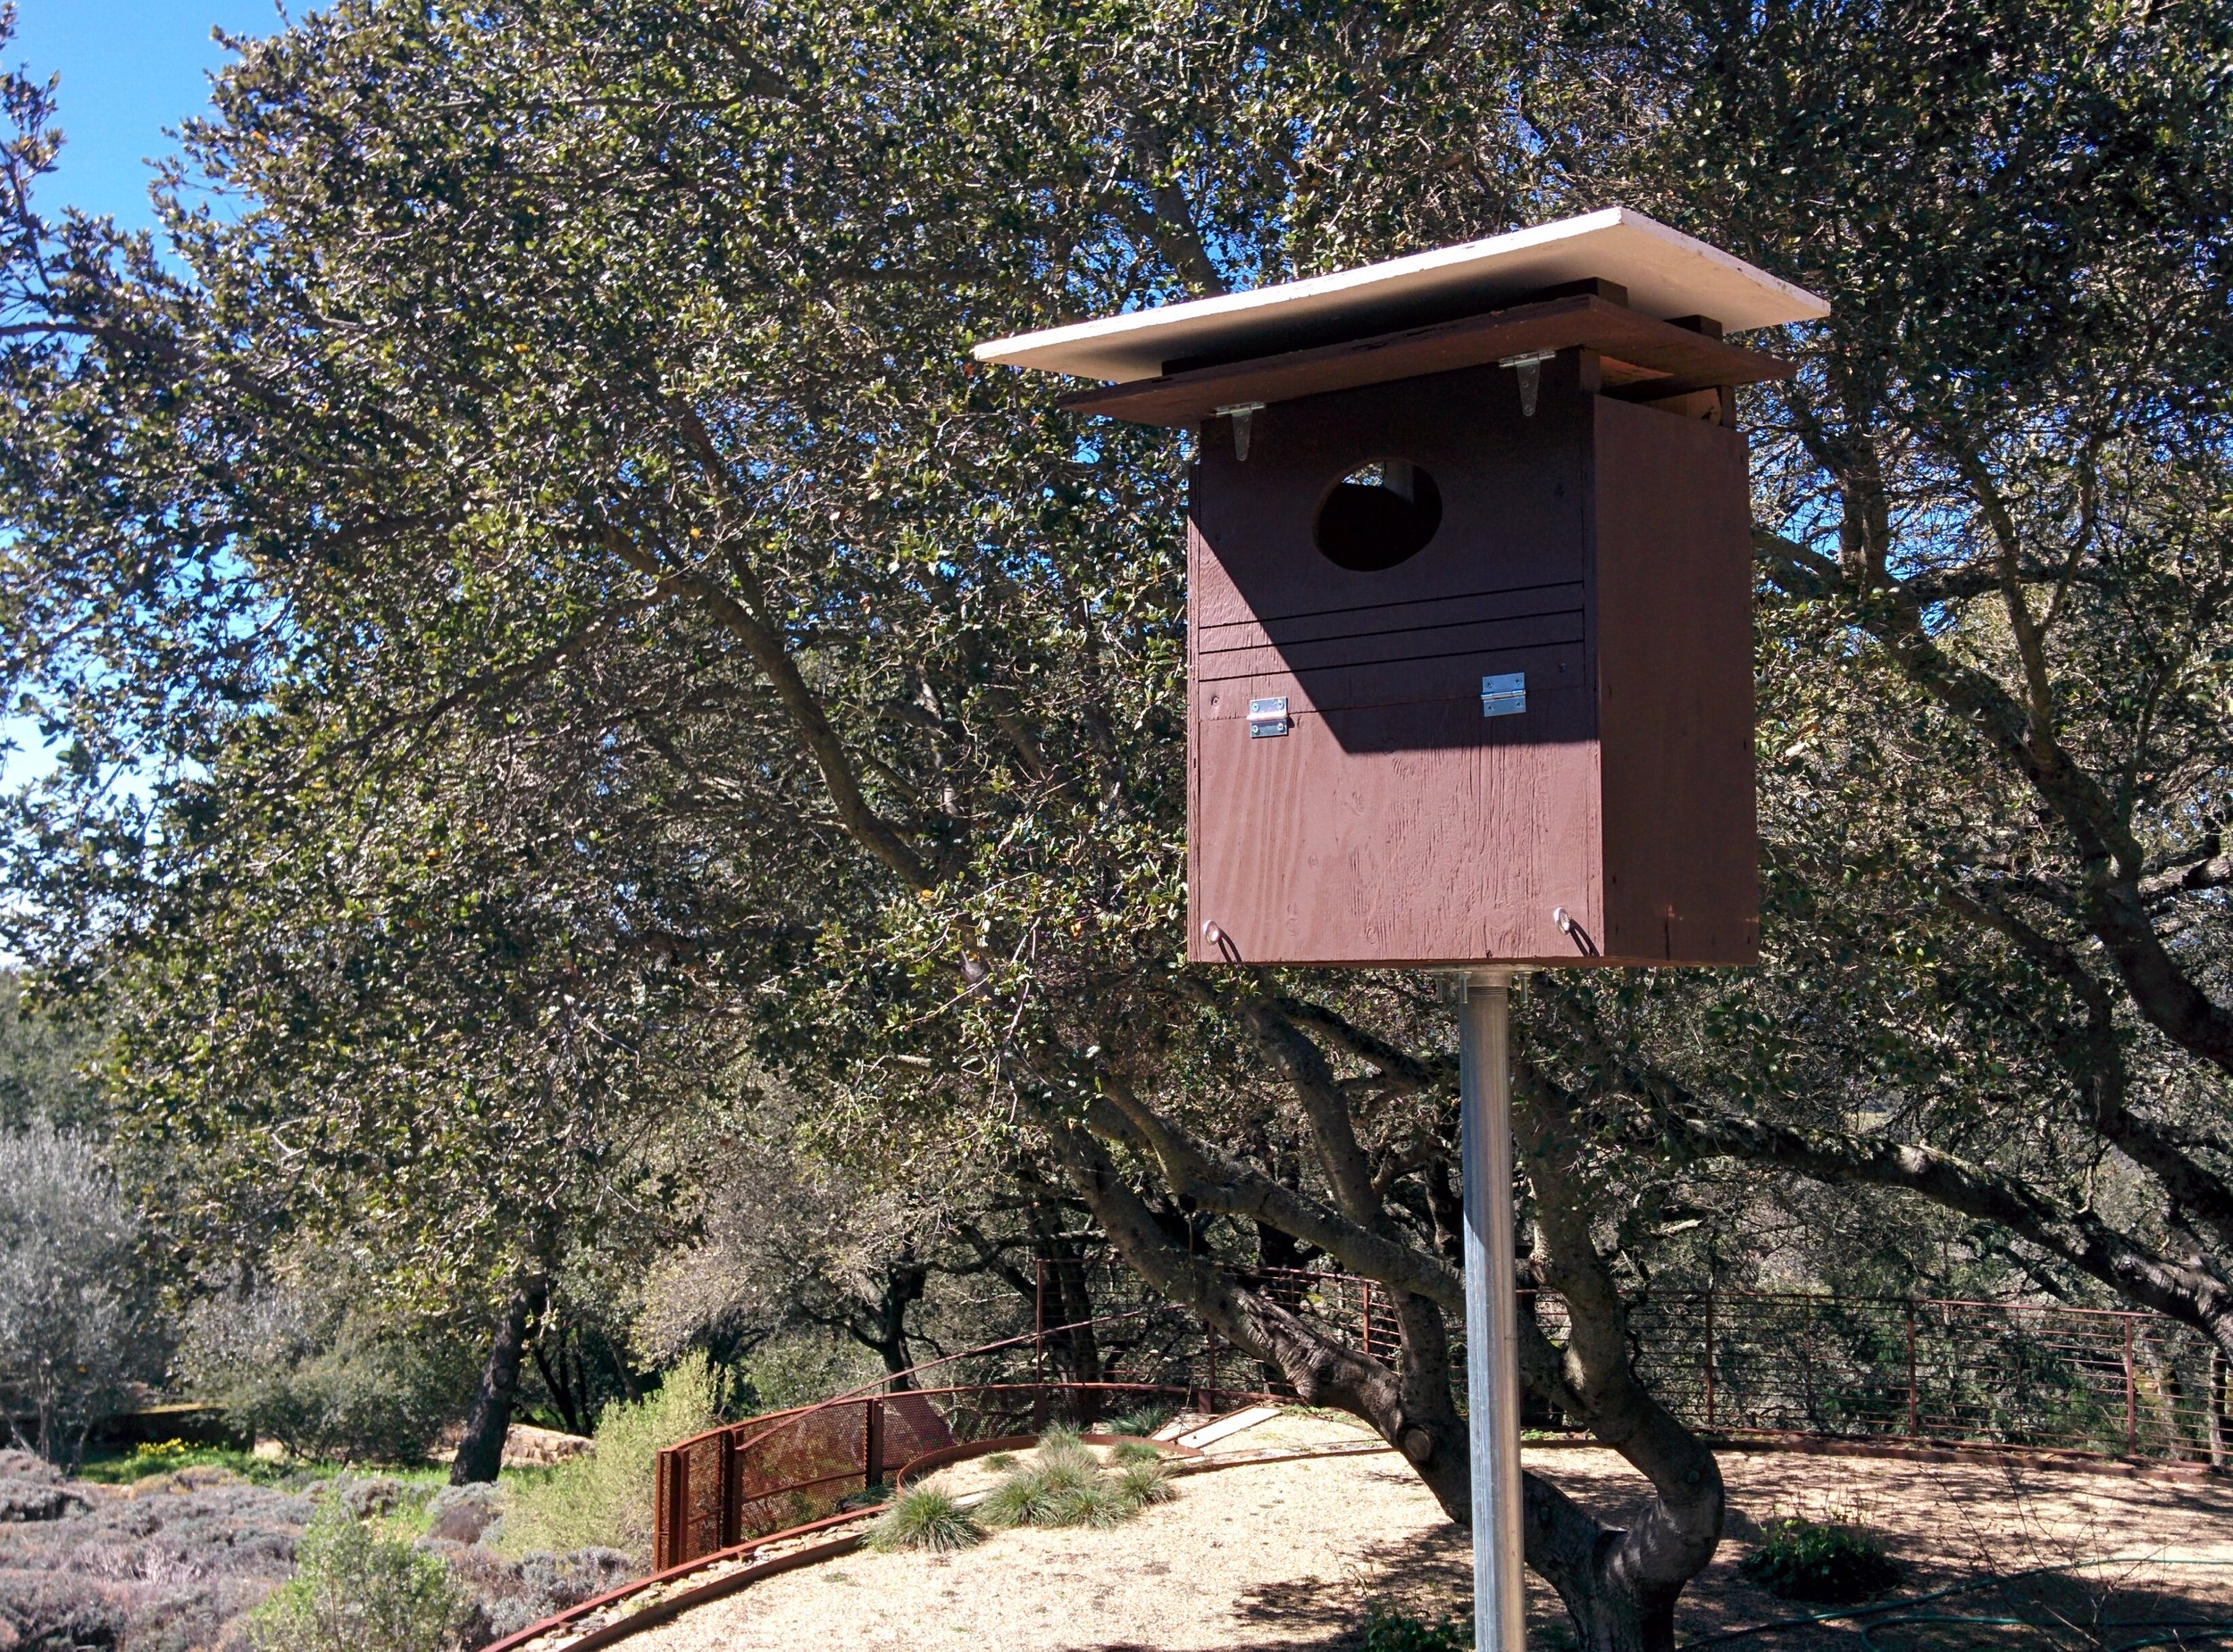 A Barn Owl box on a metal pole in Marin County, California.